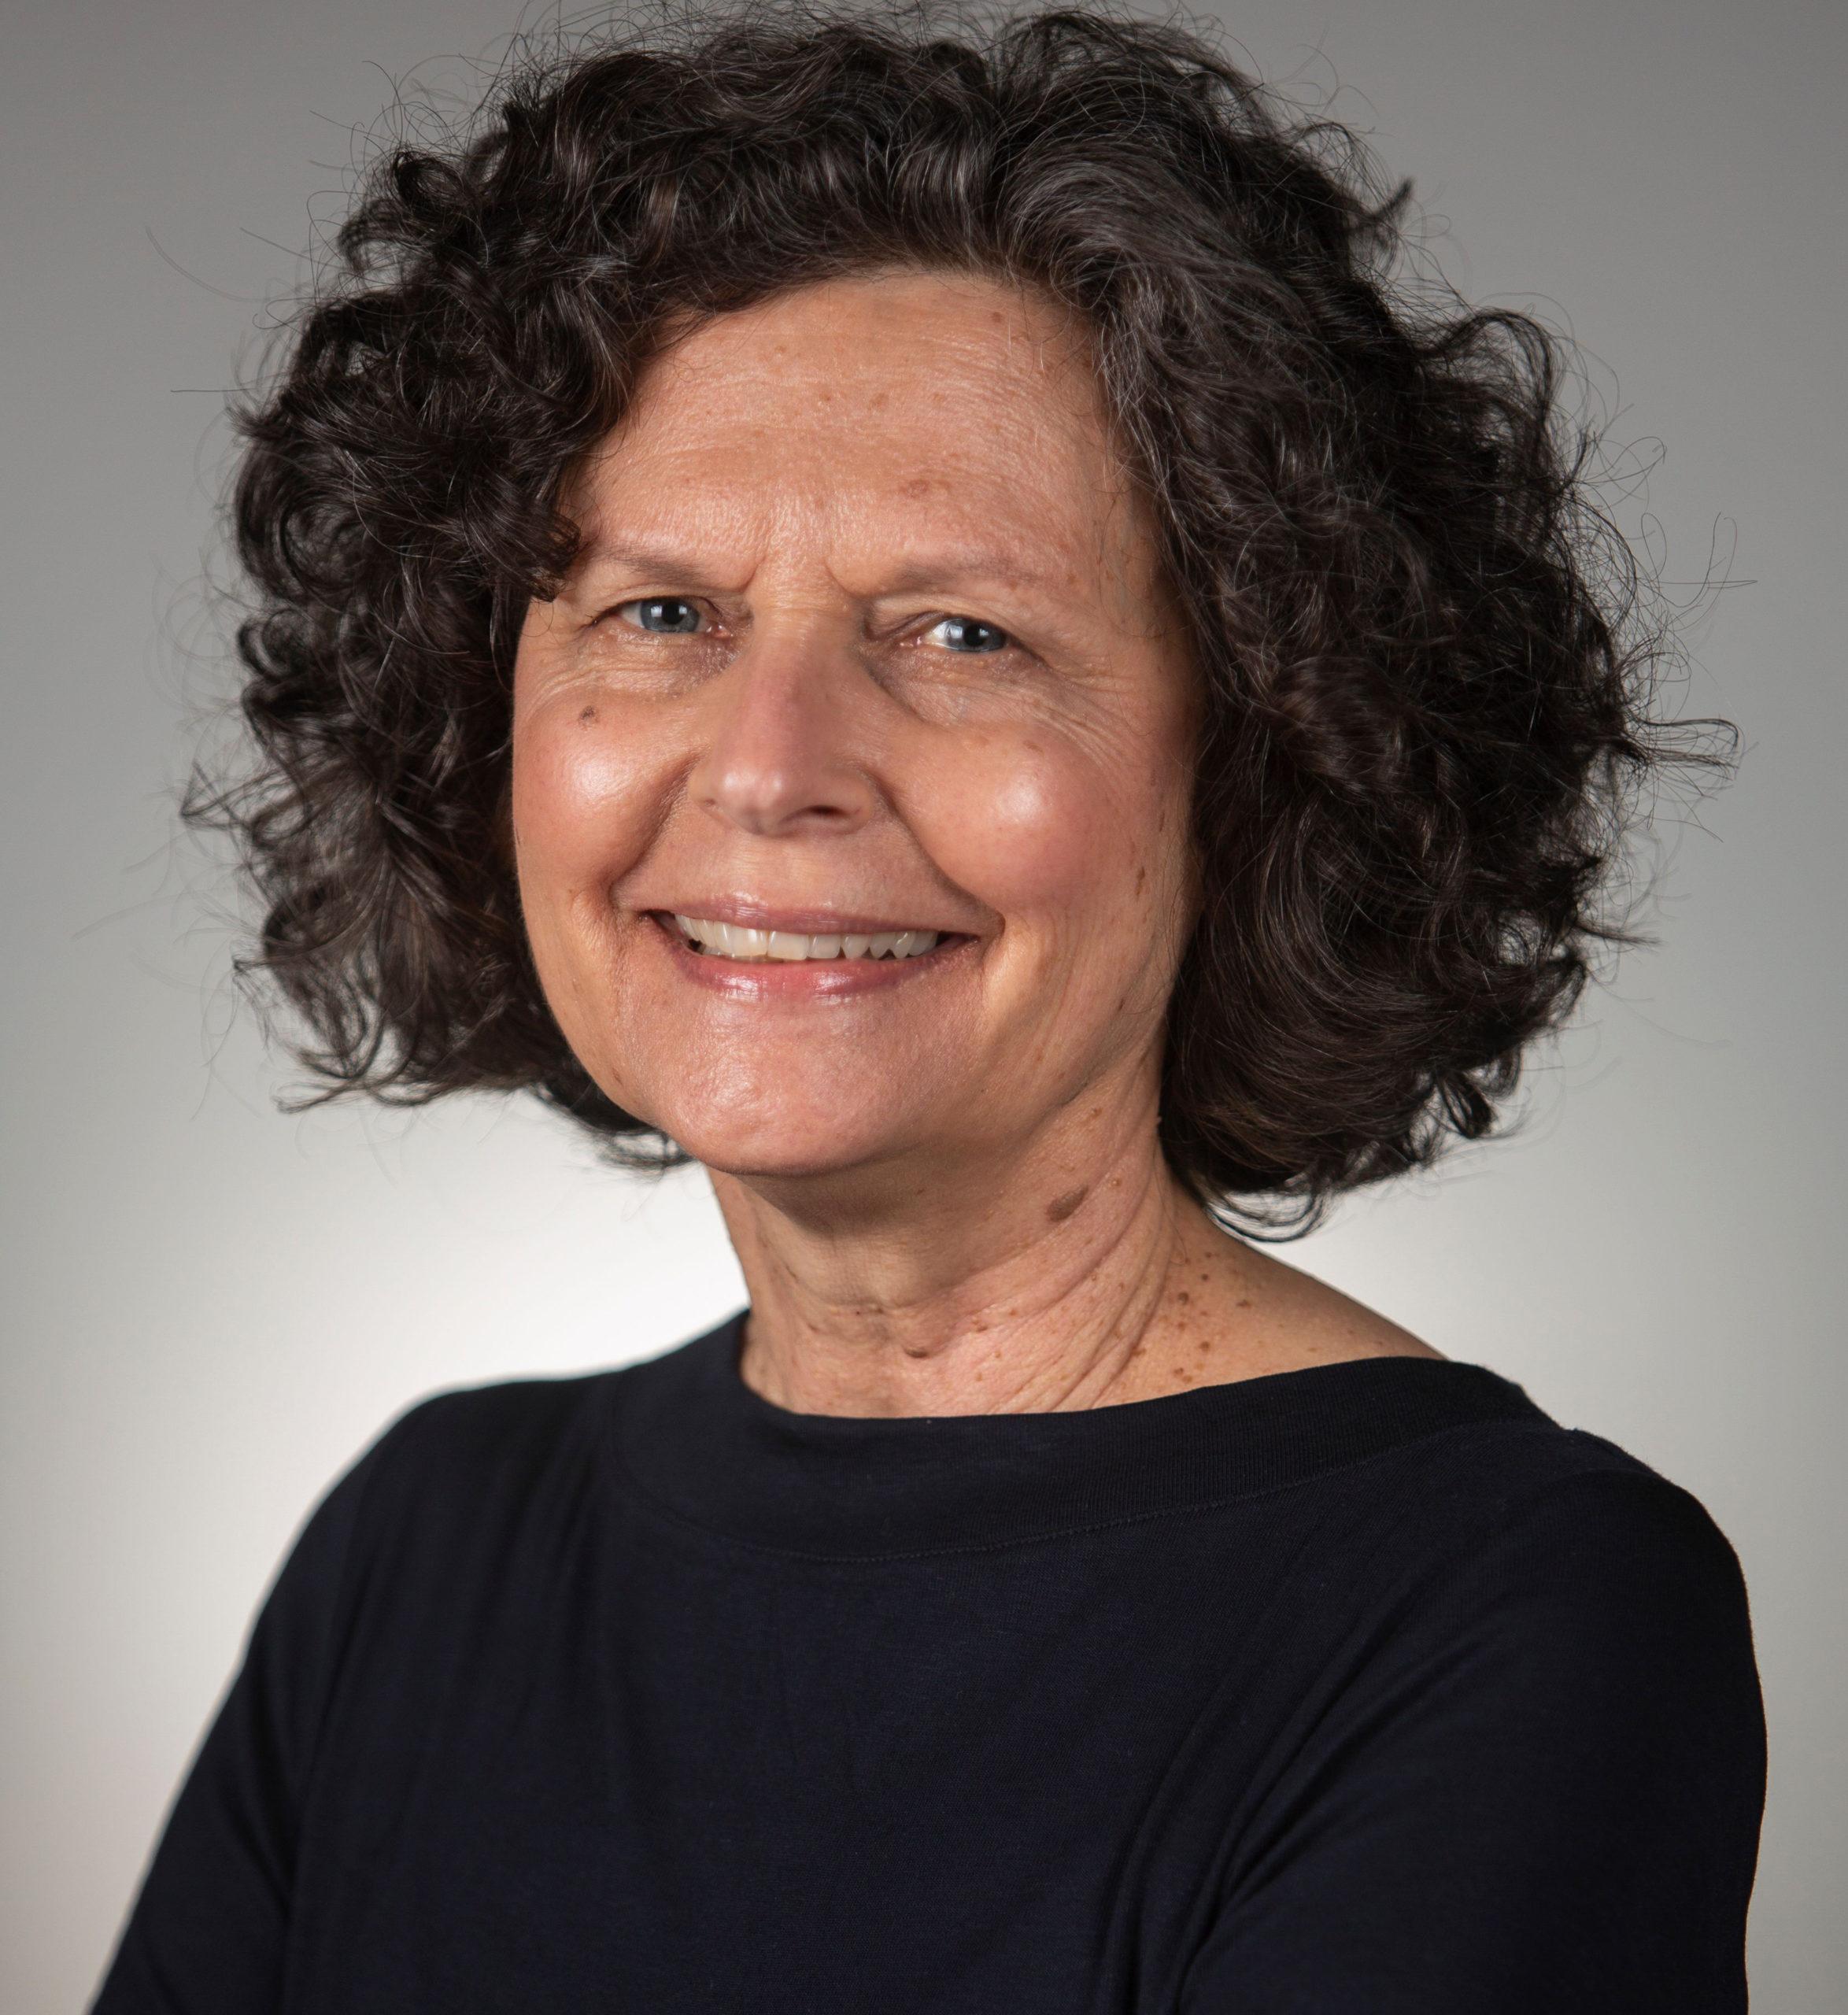 Professional headshot of Julie Buchanan